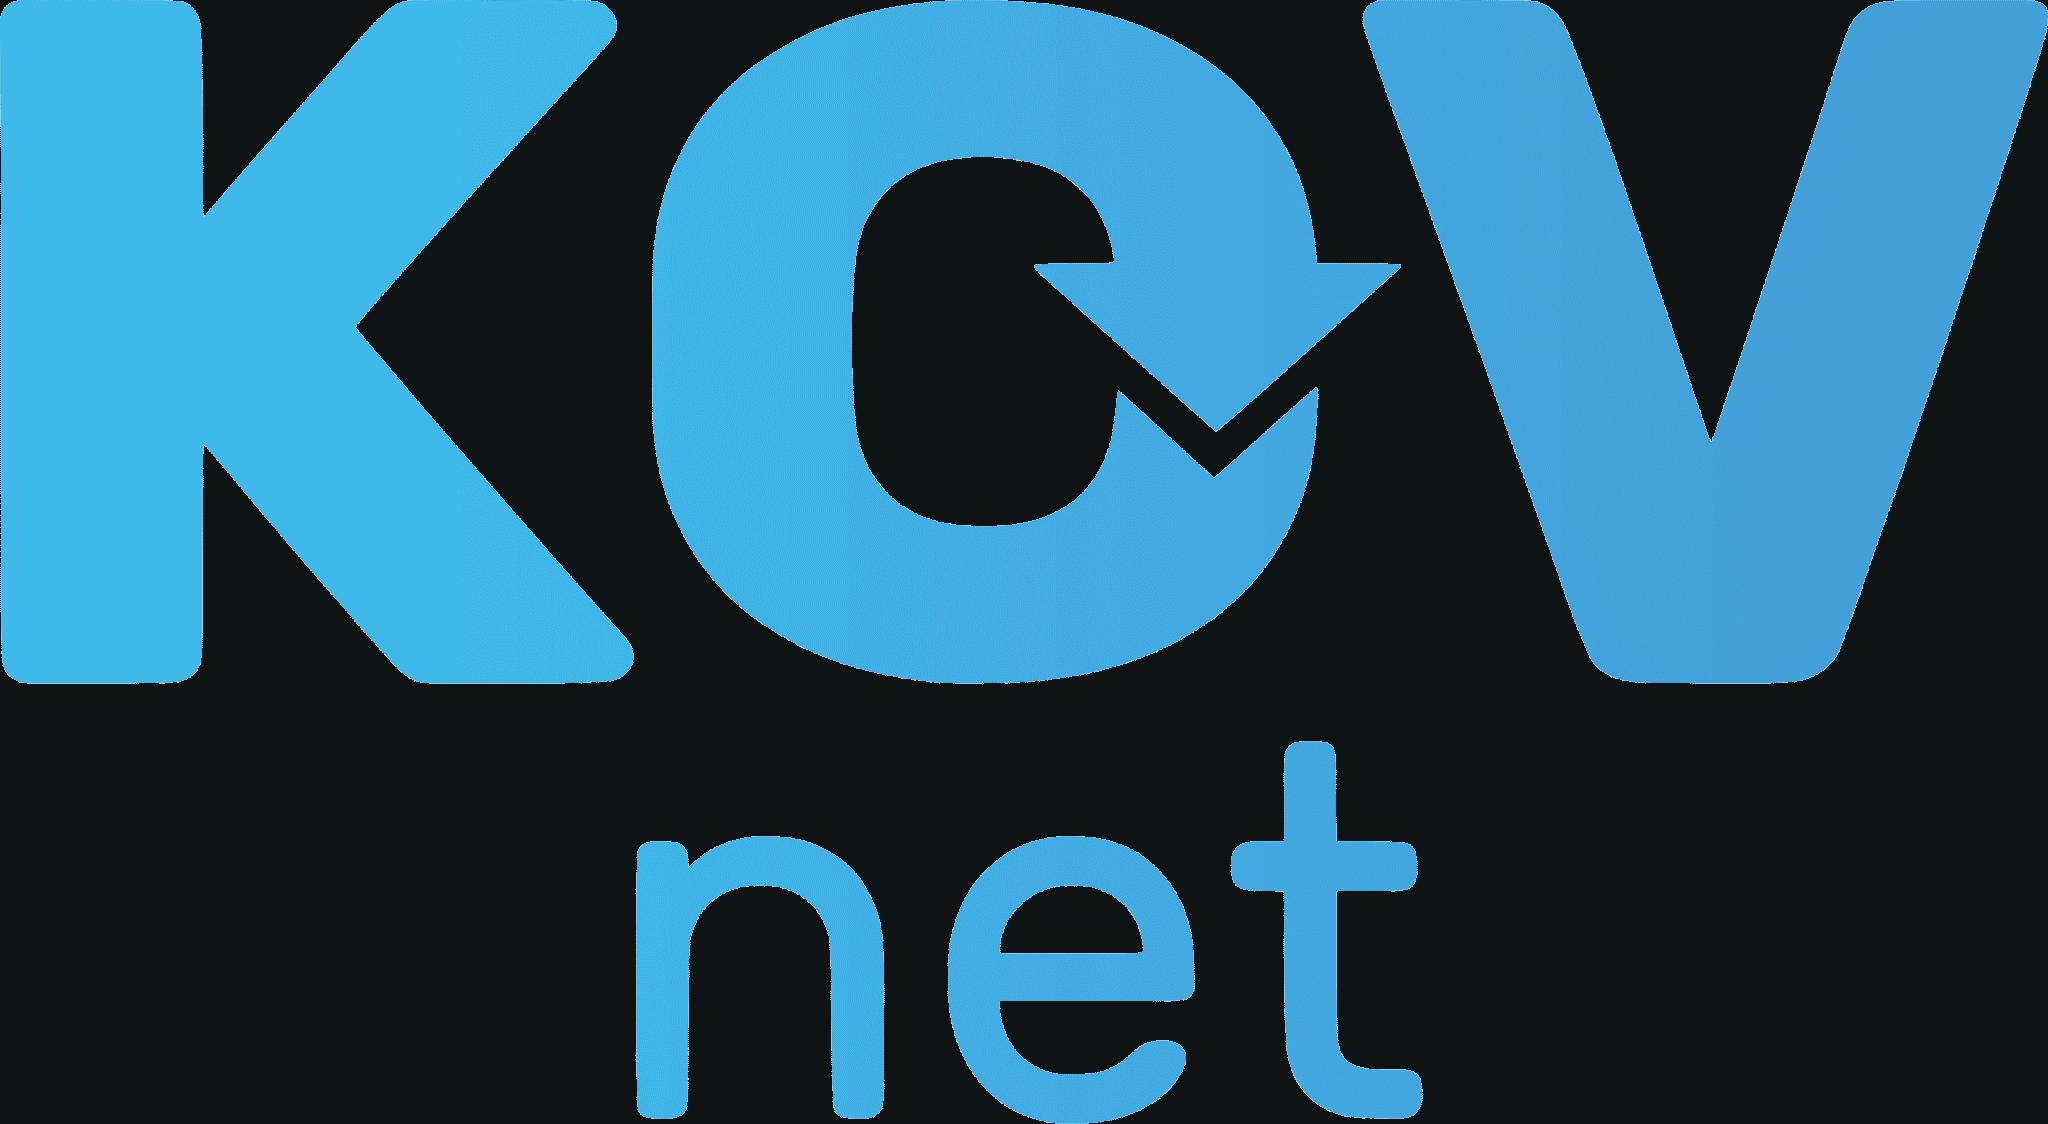 LOGO - KOVnet - Portfolio - ZoomWorks - PNG